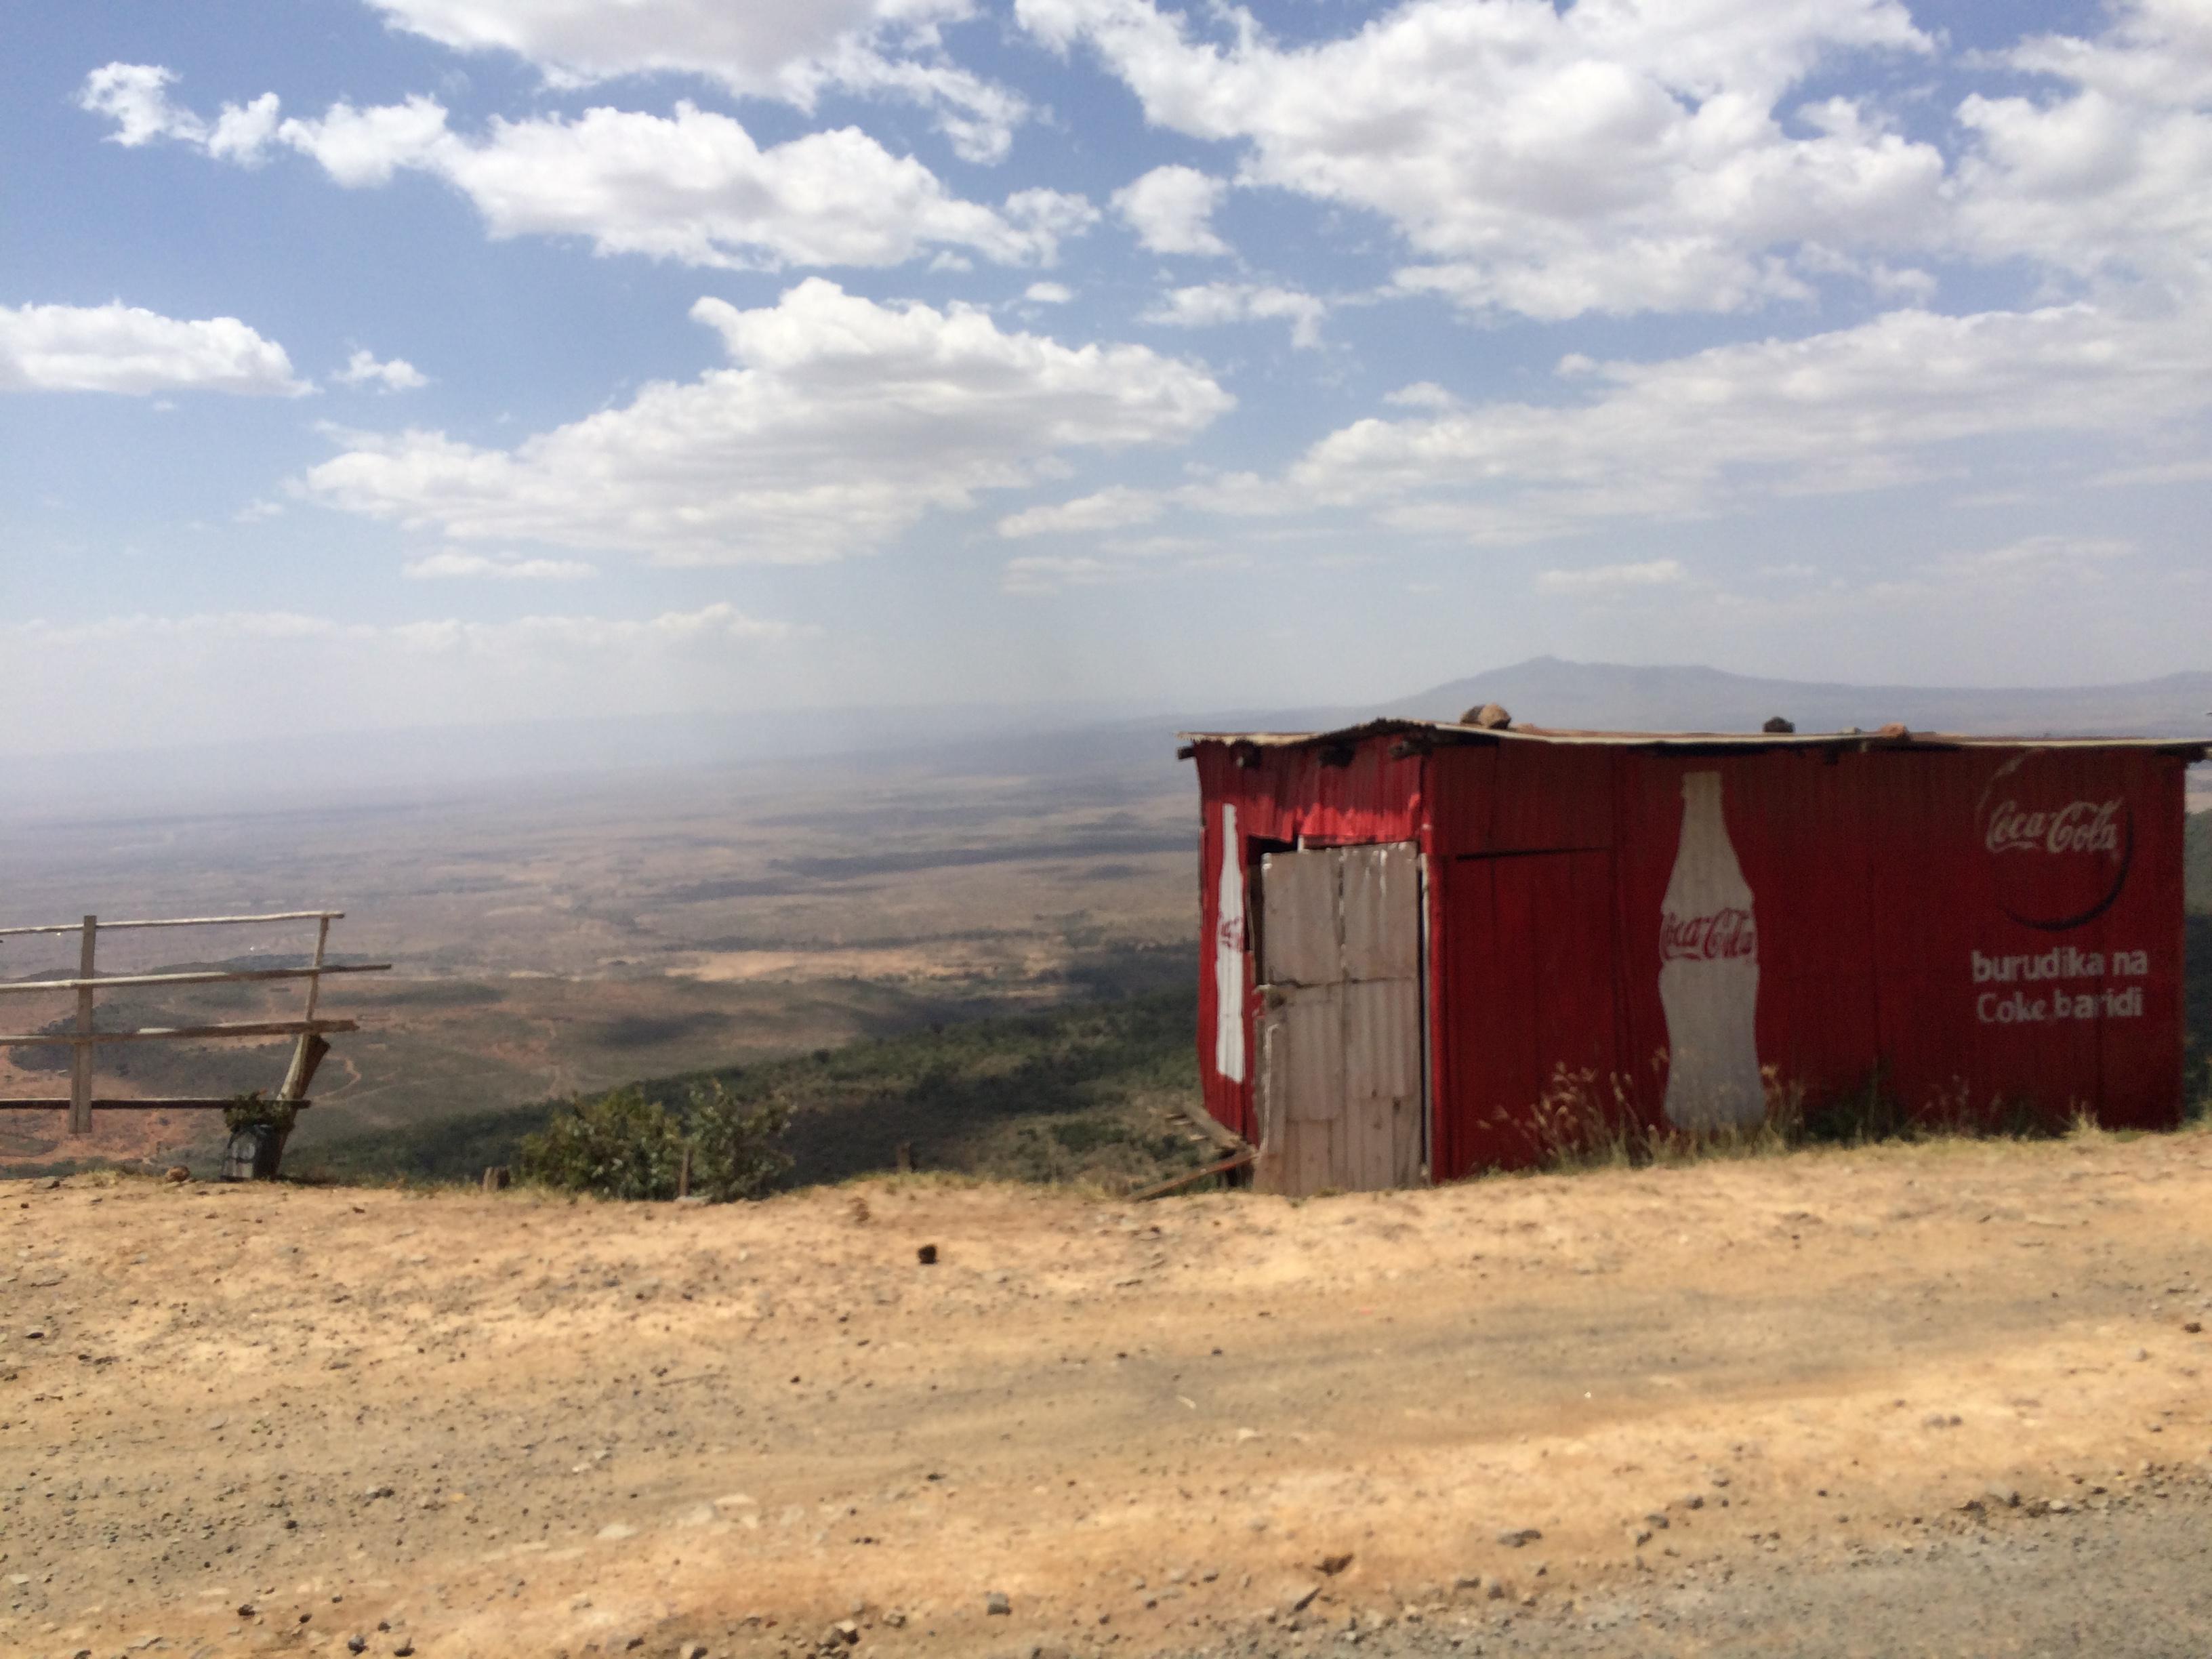 Coke advert, overlooking the Great Rift Valley, Kenya